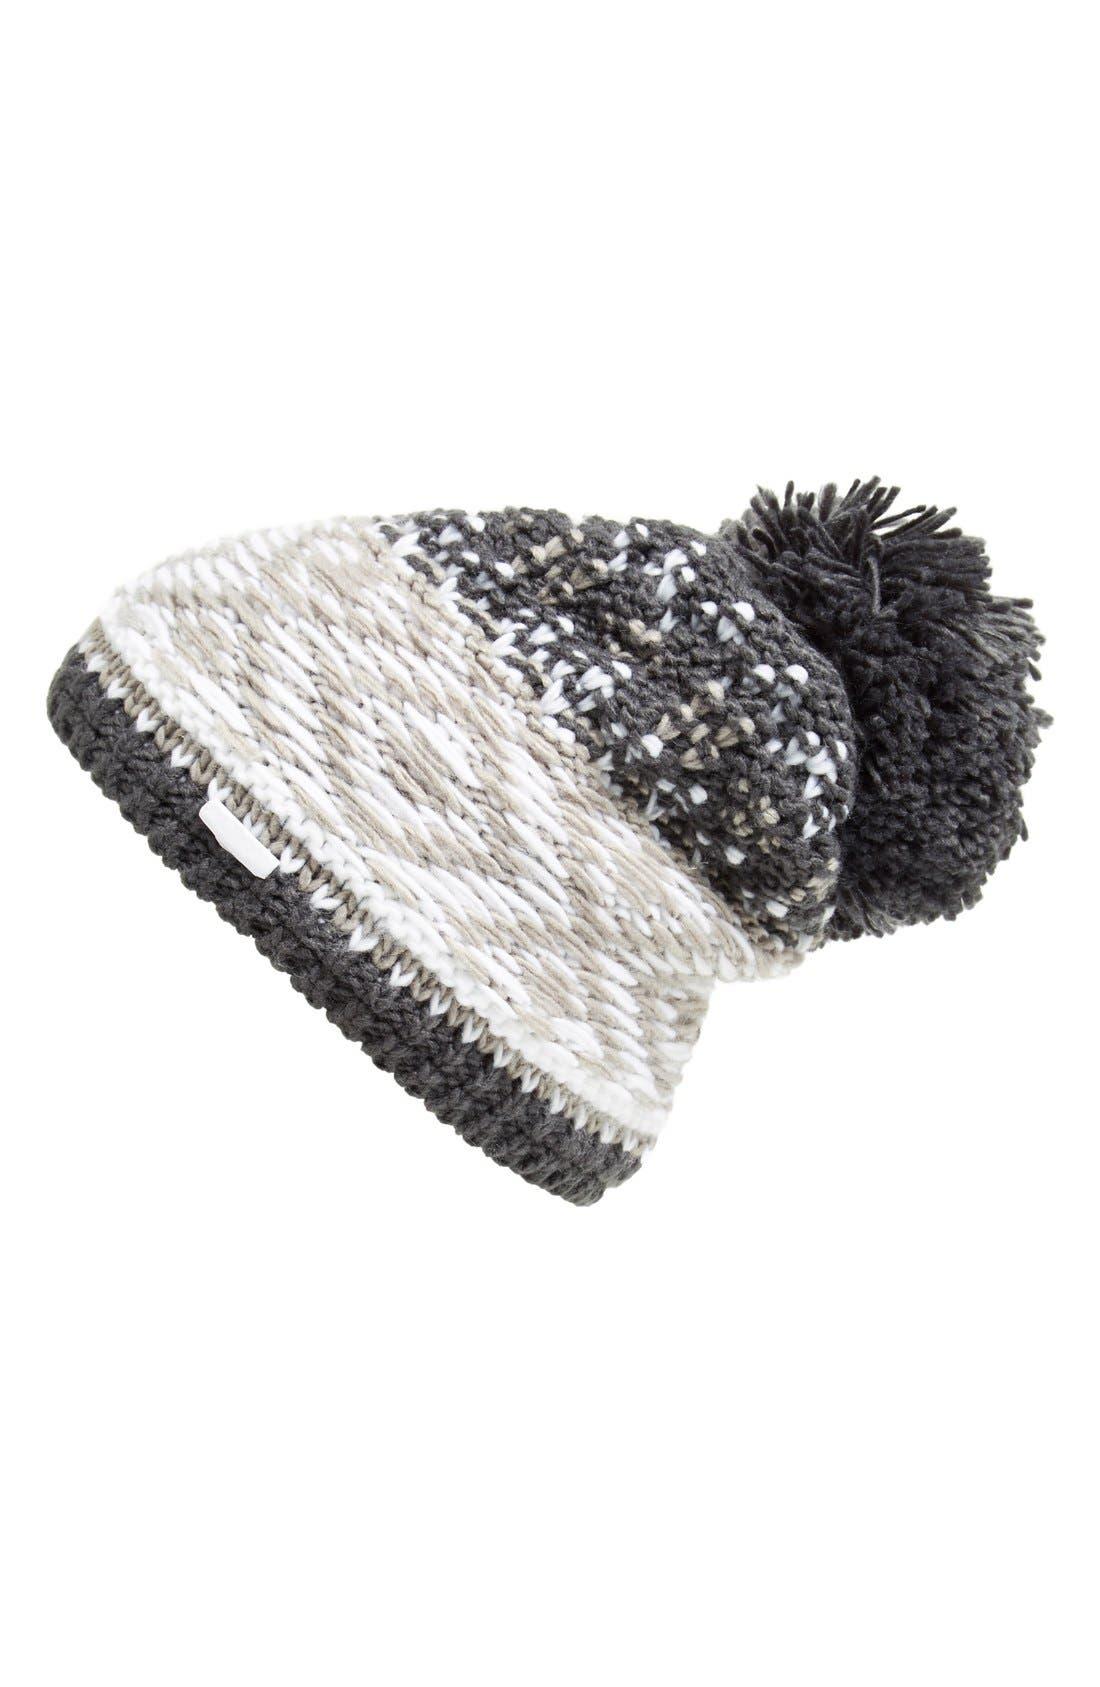 Main Image - LoleJacquard Knit Beanie